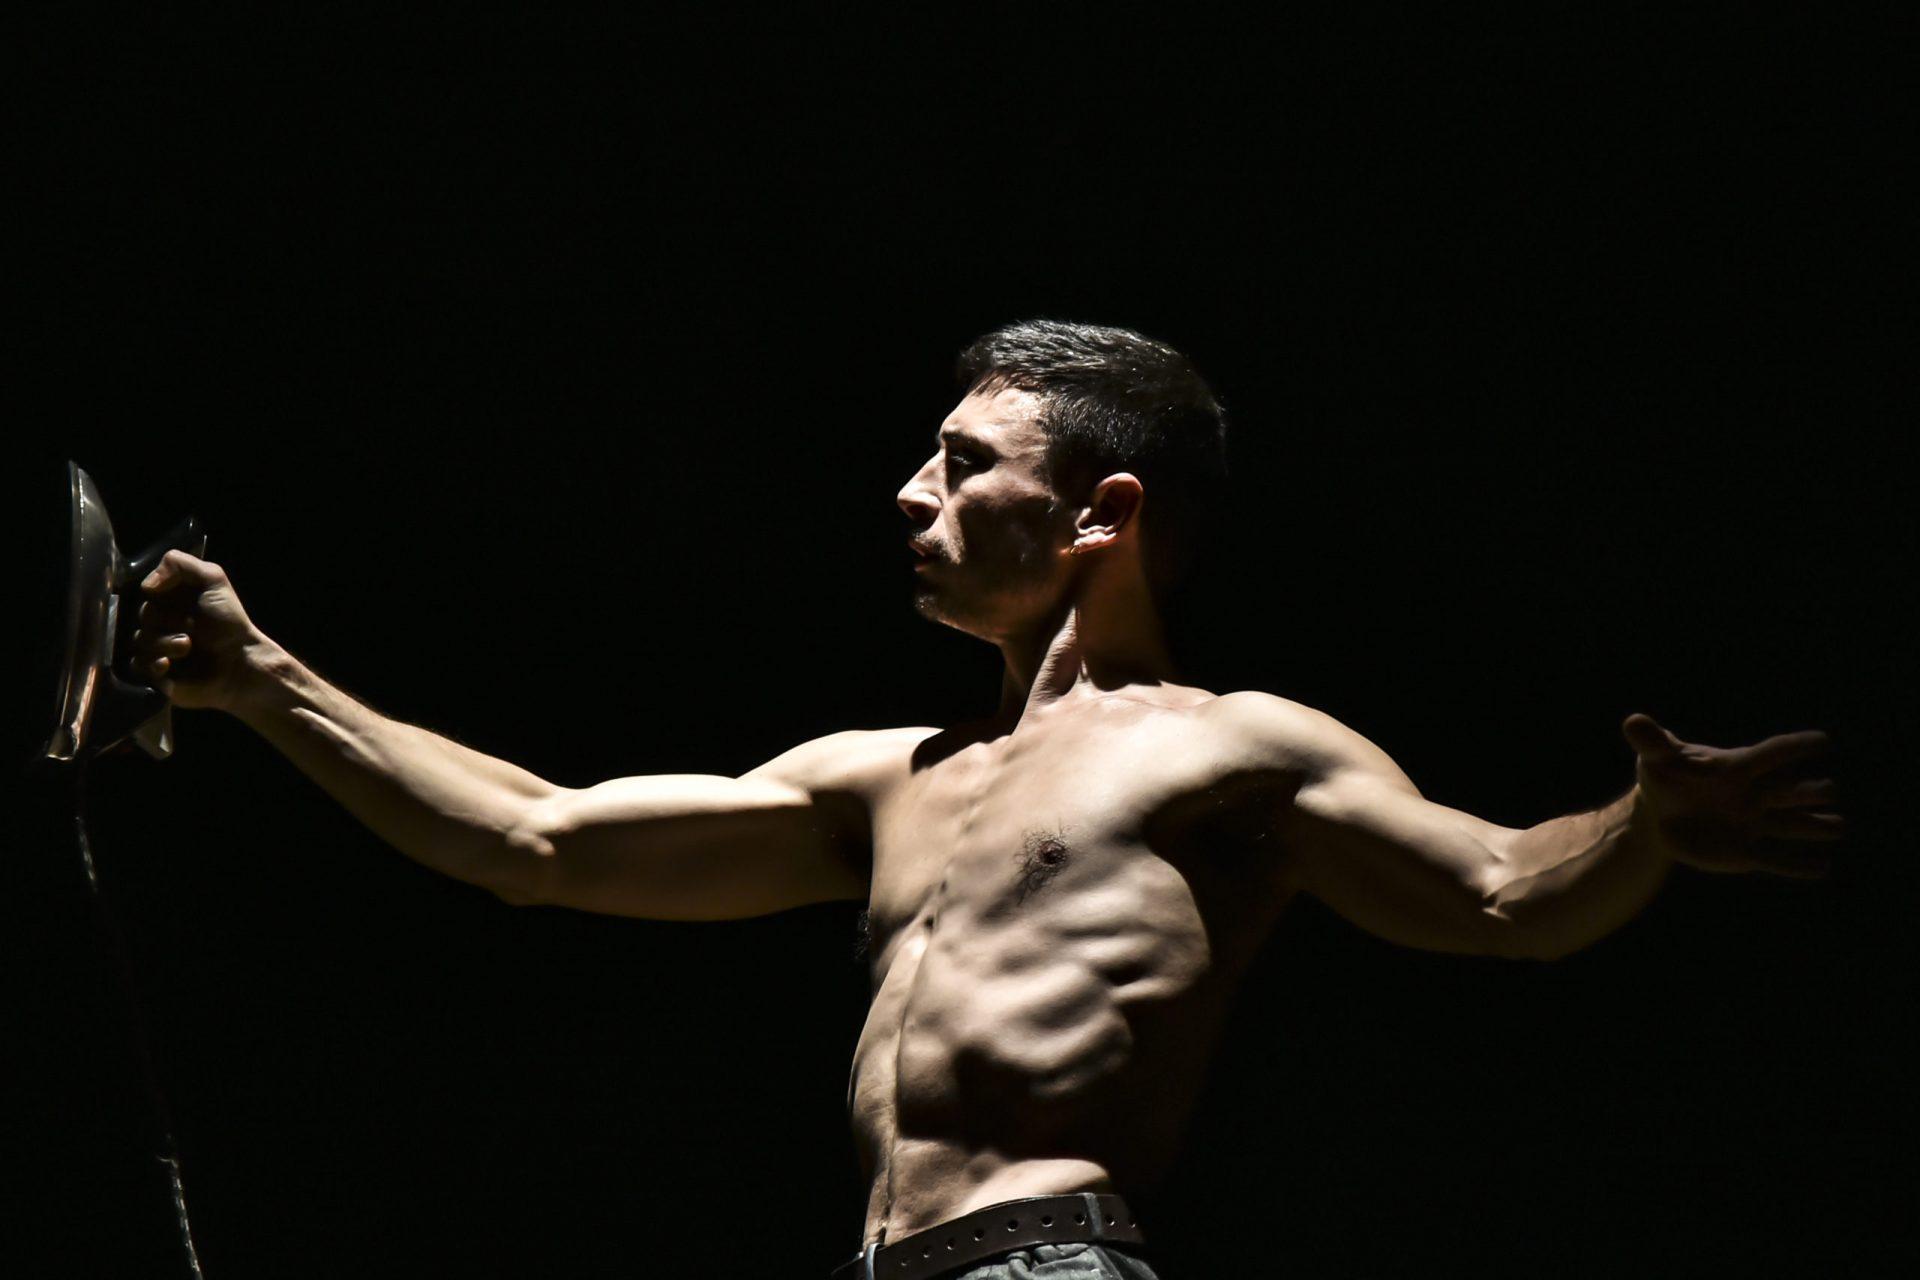 spettacolo circo contemporaneo mon circo asti magdalcan 15 e 16 febbraio